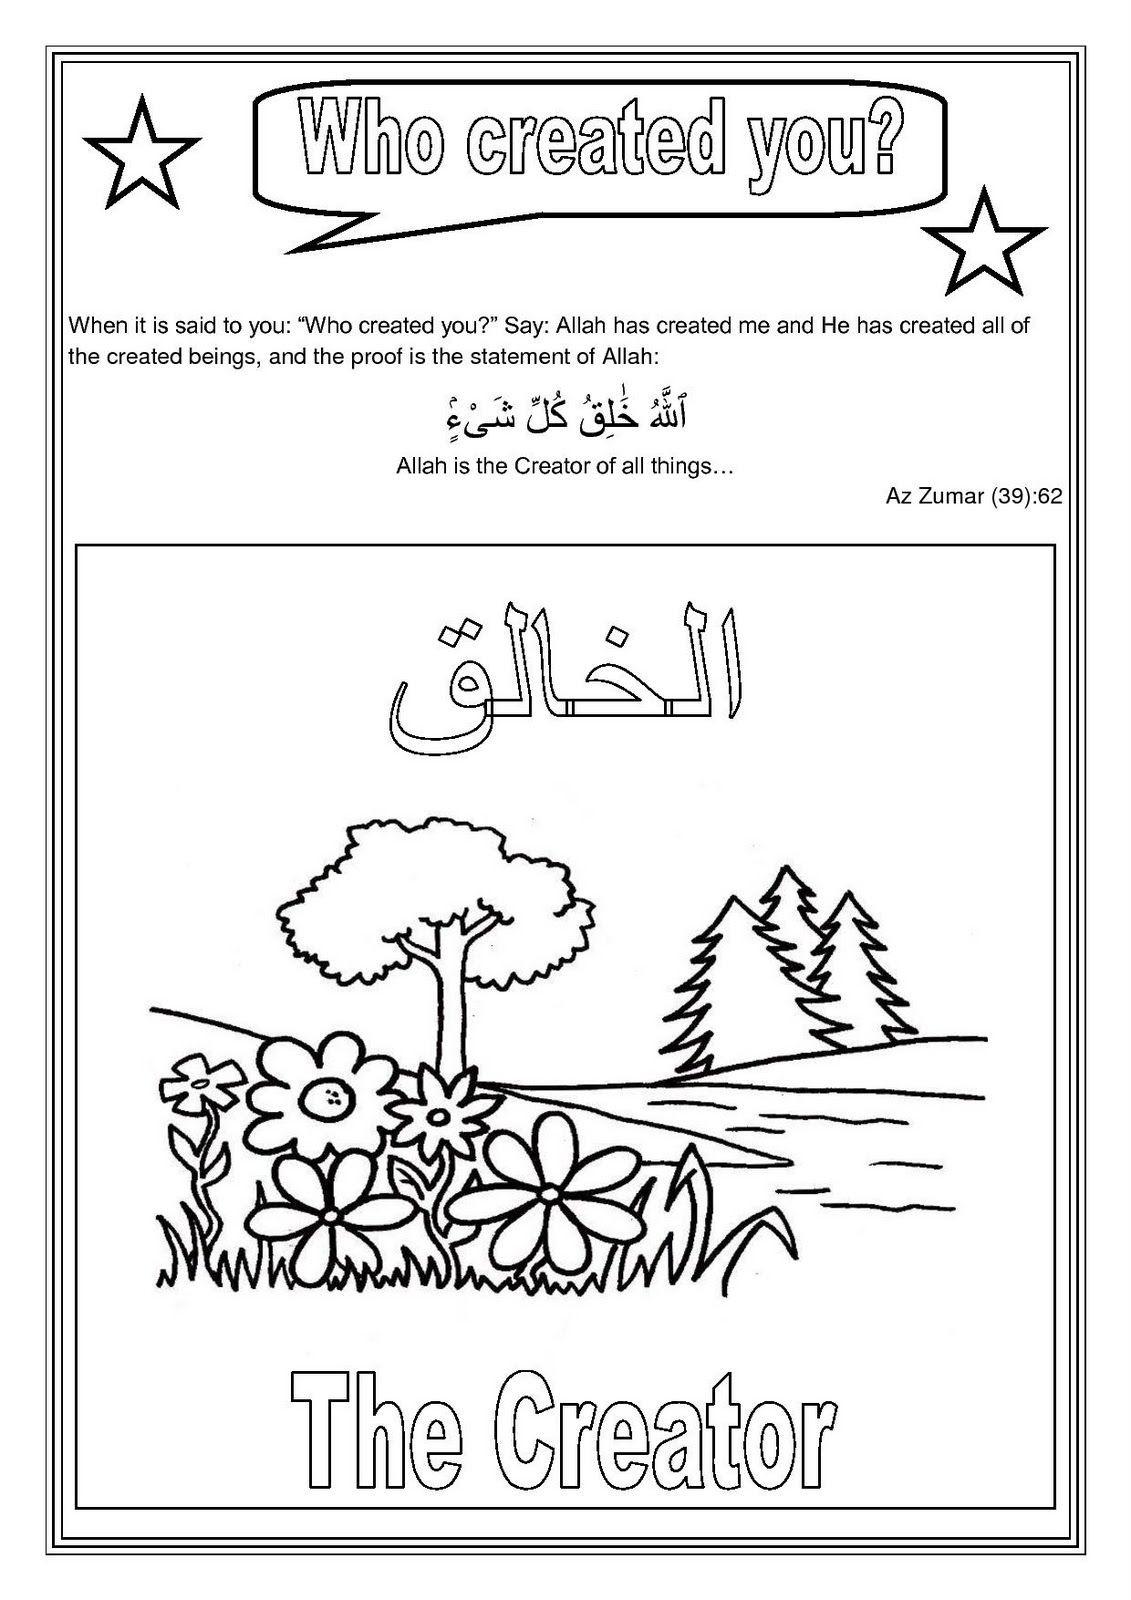 Fun Islamic Coloring Sheets For Kids  a muslim homeschool Islamic Stu s Lesson 1 continued